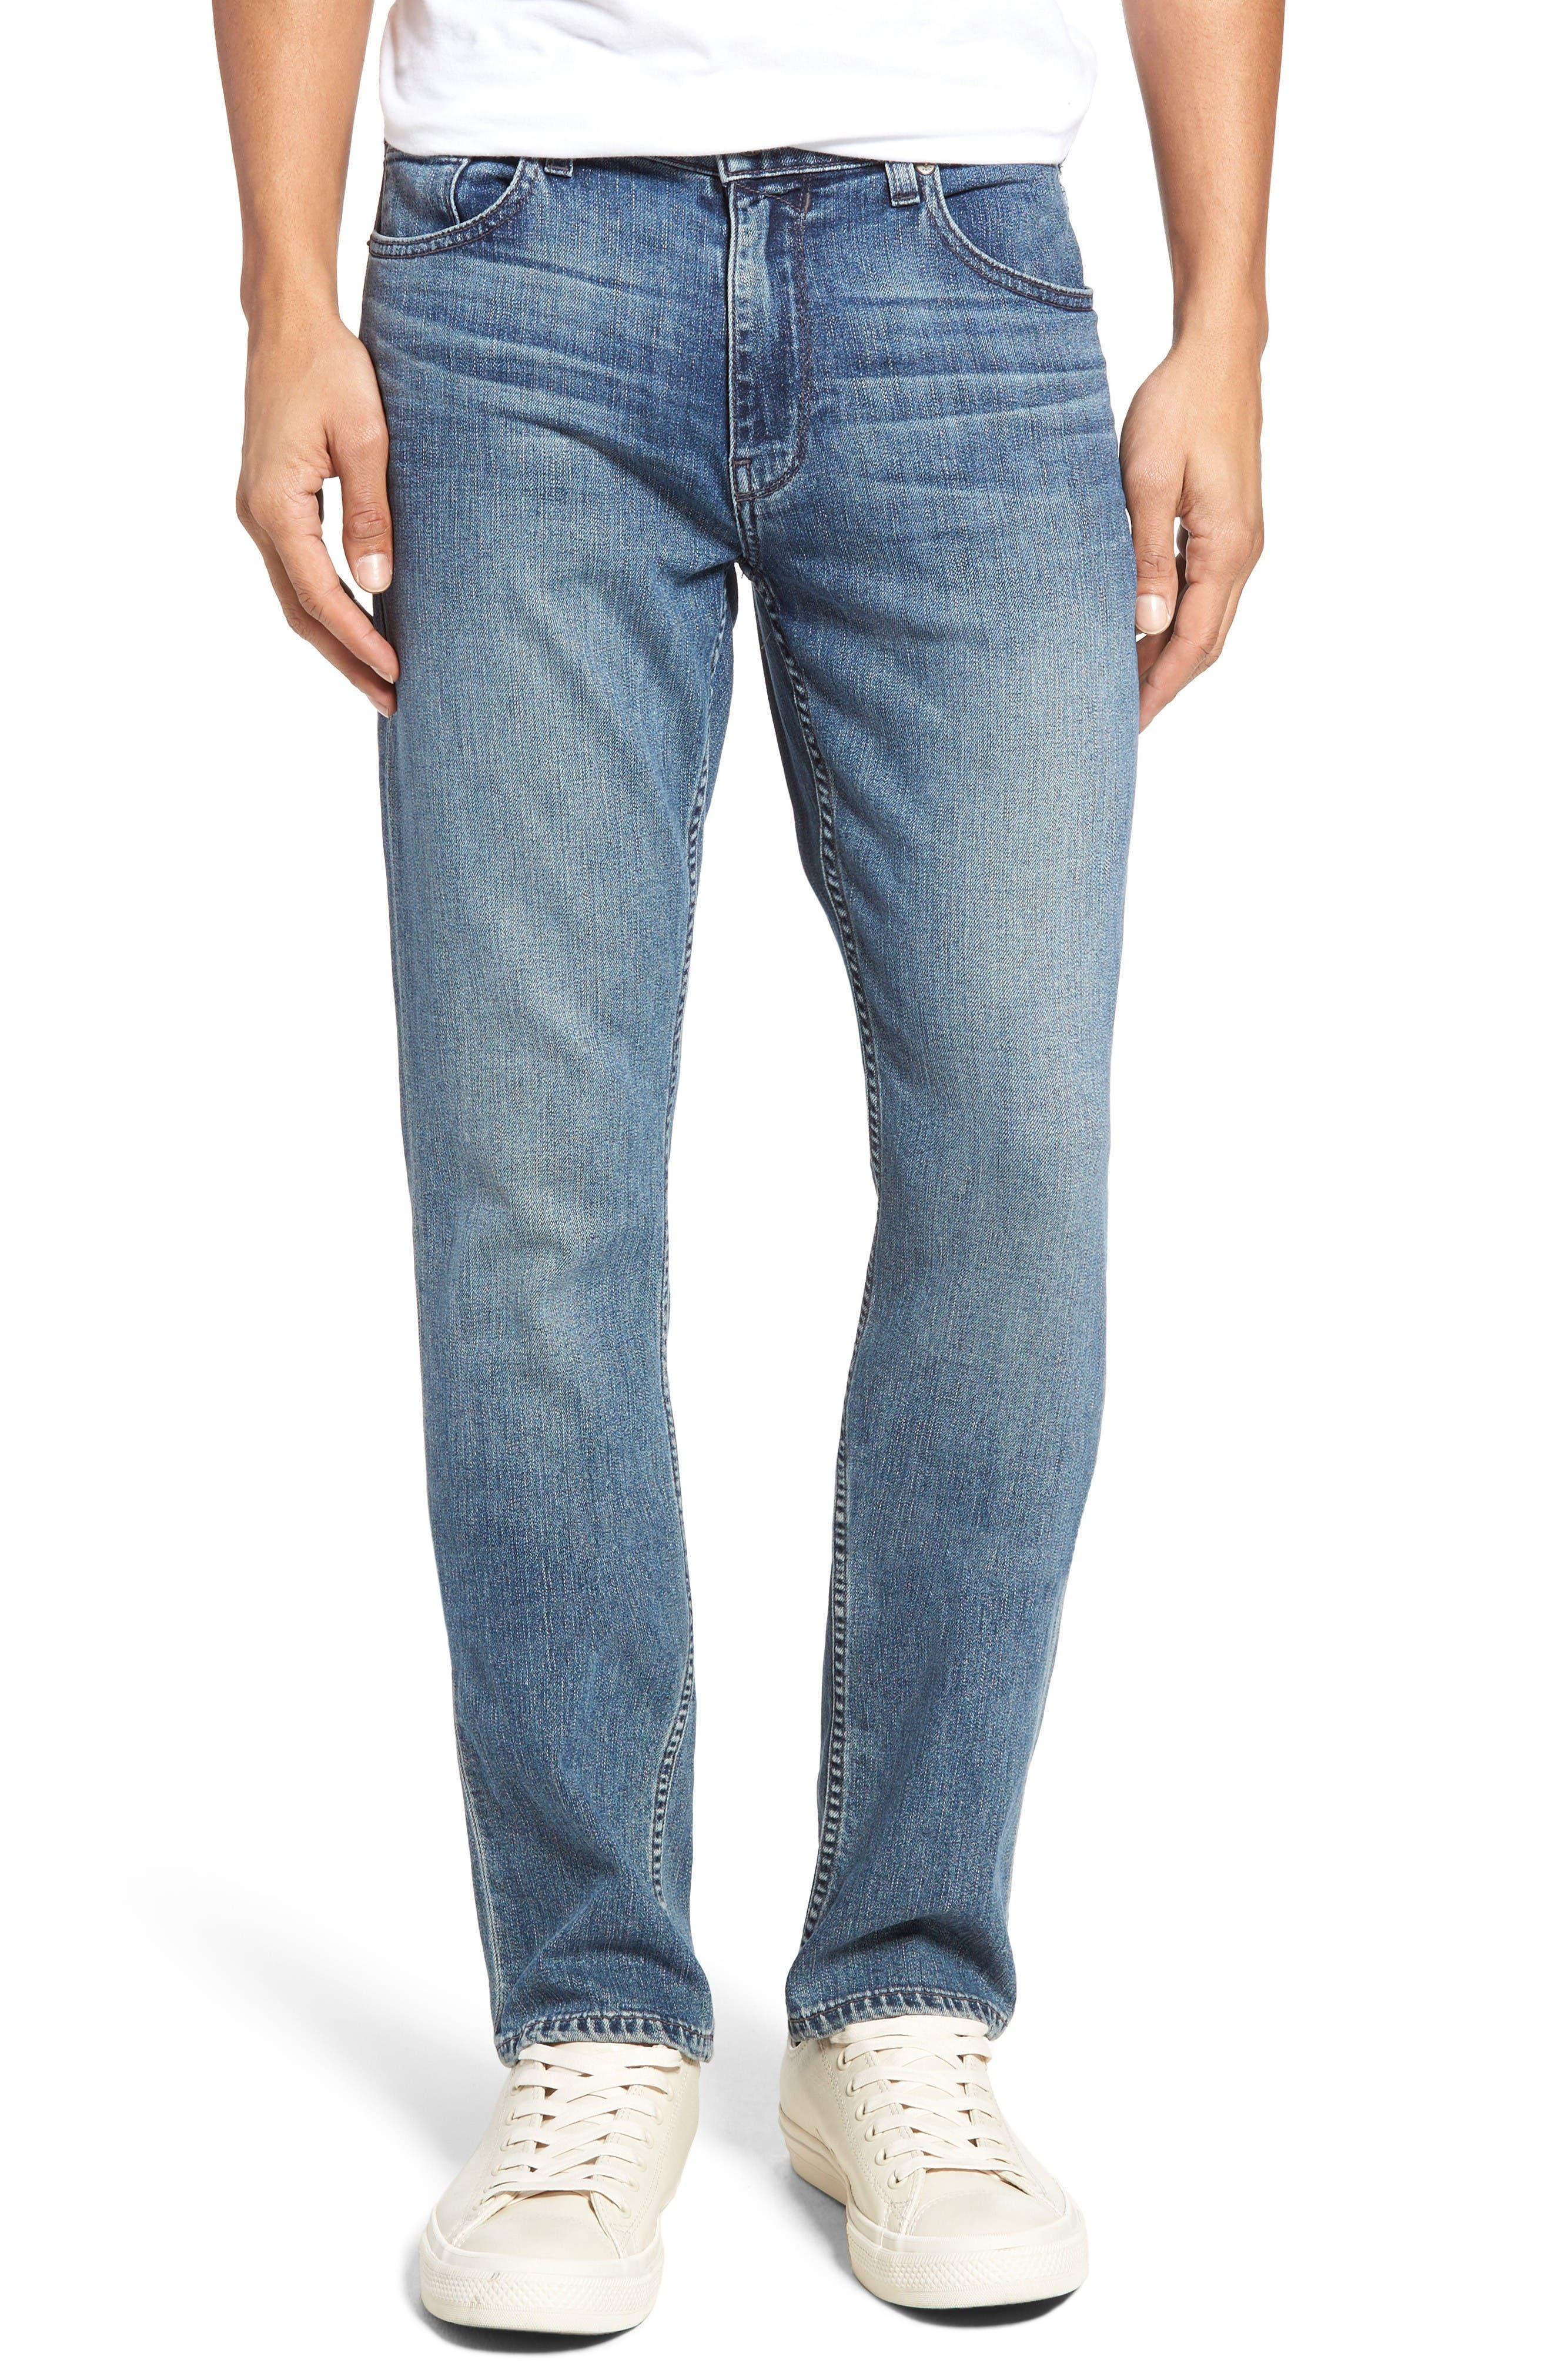 Normandie Straight Leg Jeans,                         Main,                         color, Gibbs